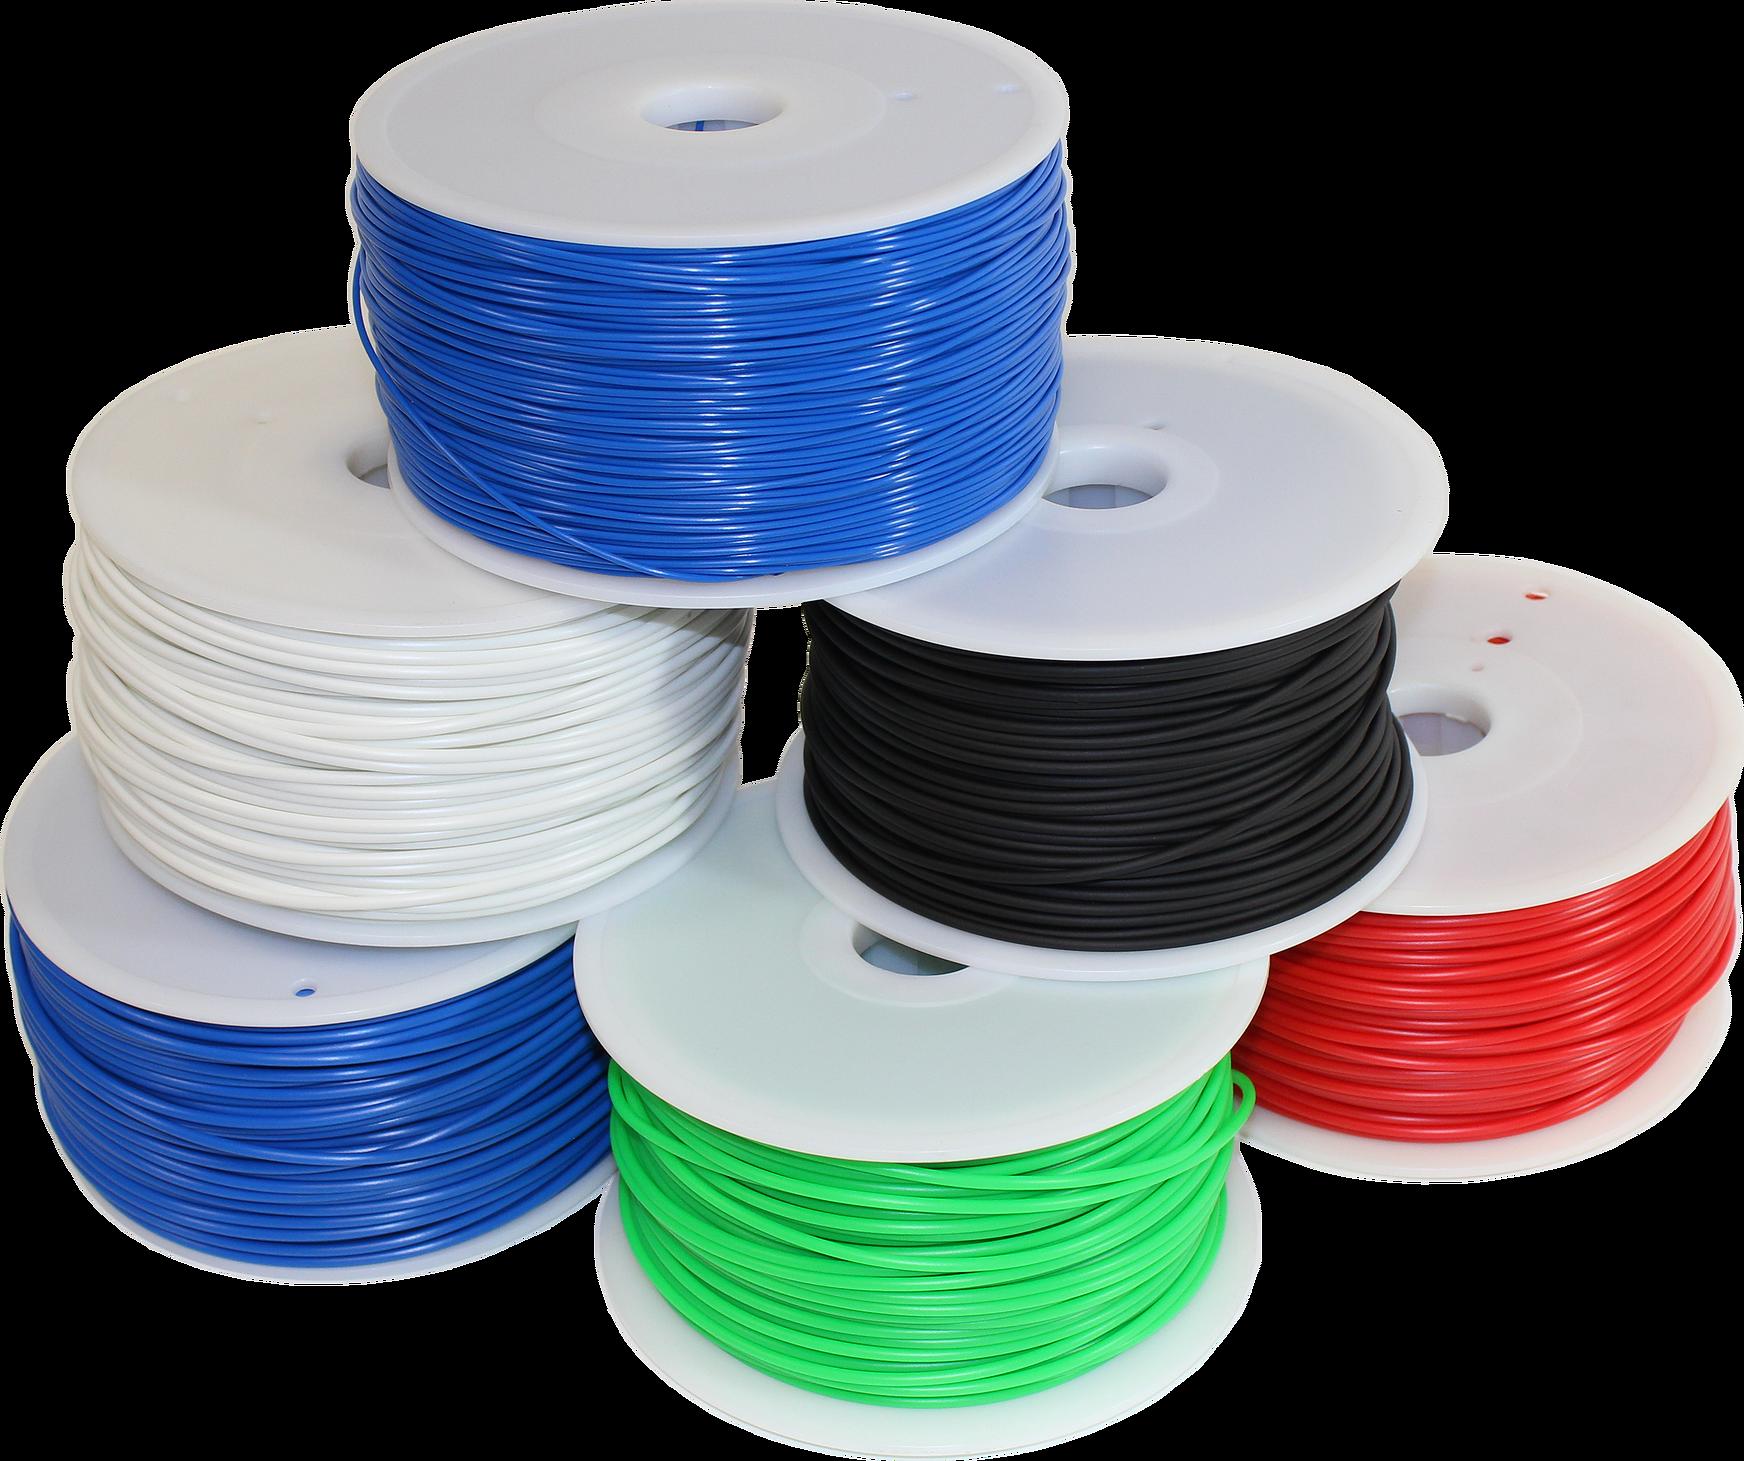 Best 3d Pen Filament Refills Abs And Pla Printer Materialsprinter Materials